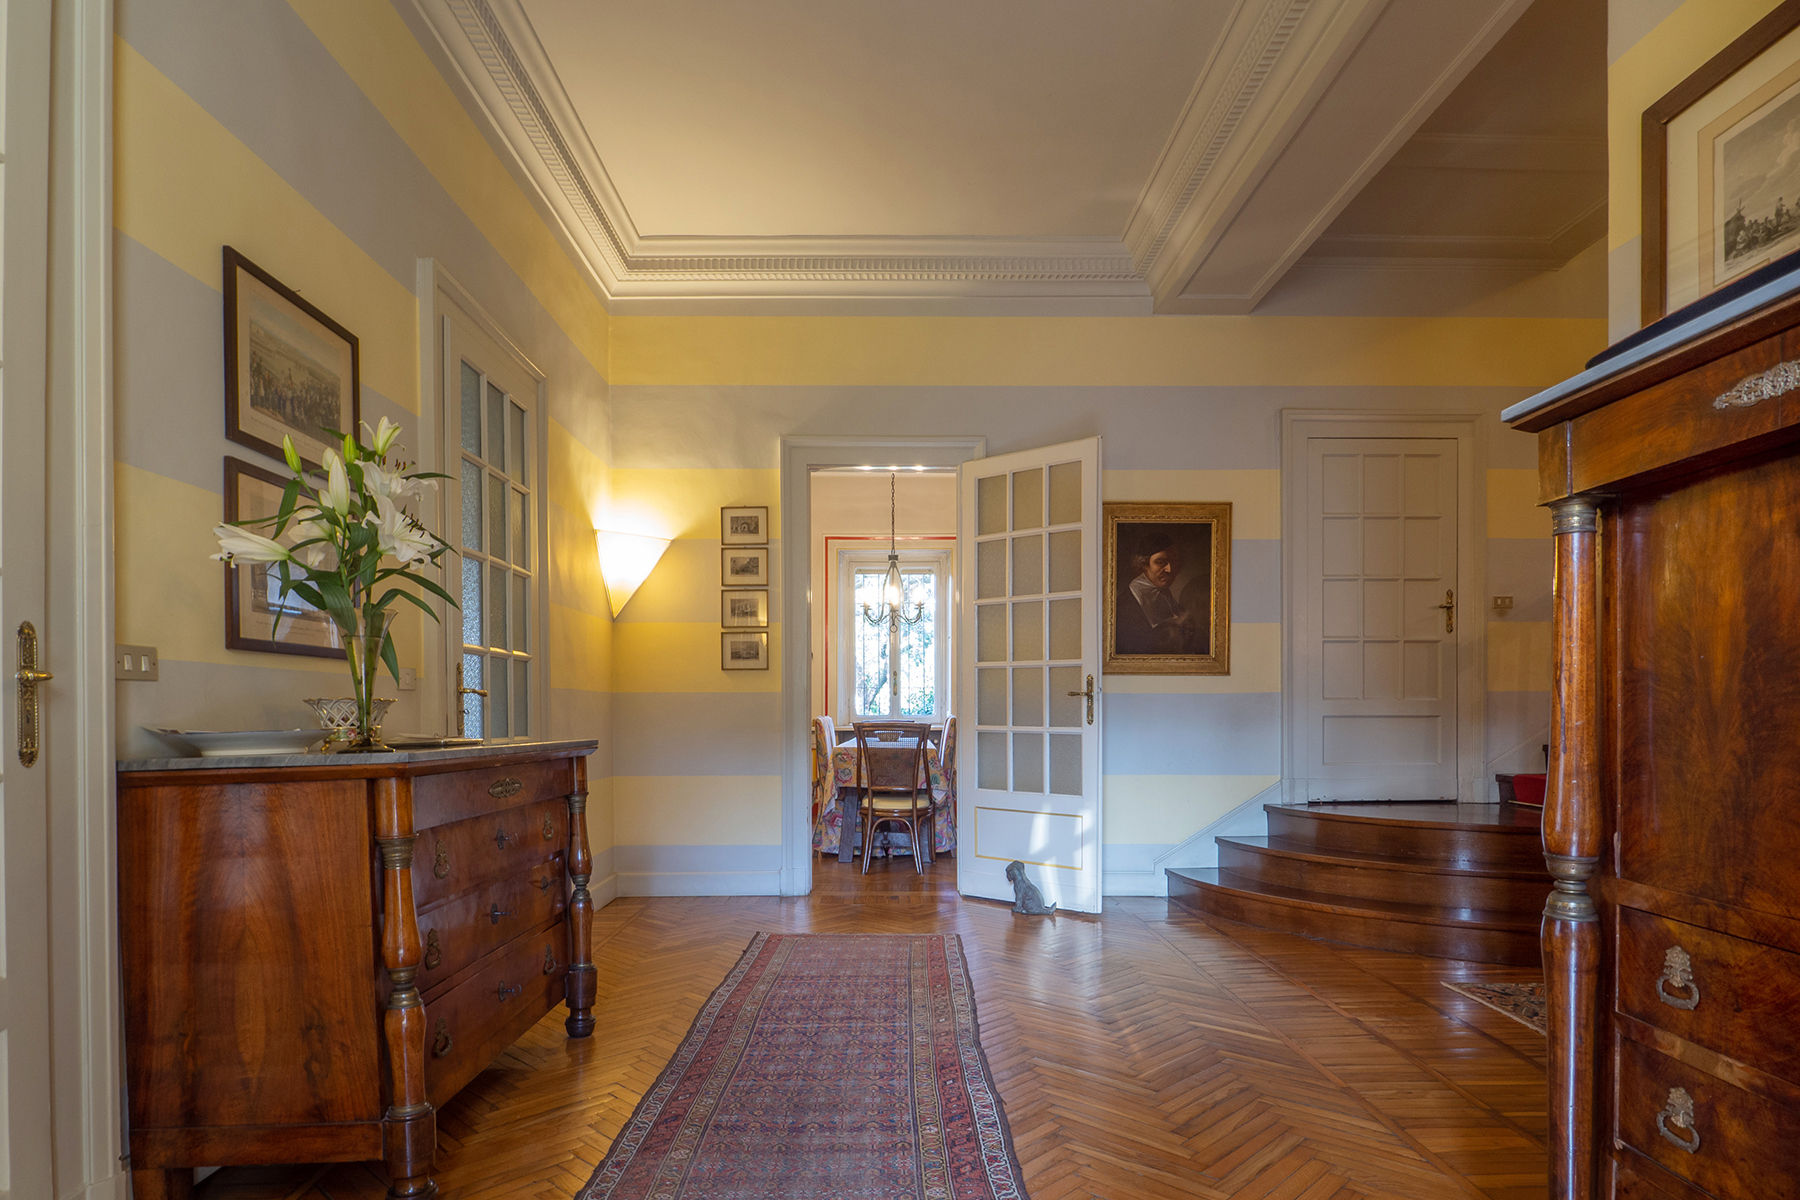 Casa indipendente in Vendita a Torino: 5 locali, 657 mq - Foto 6